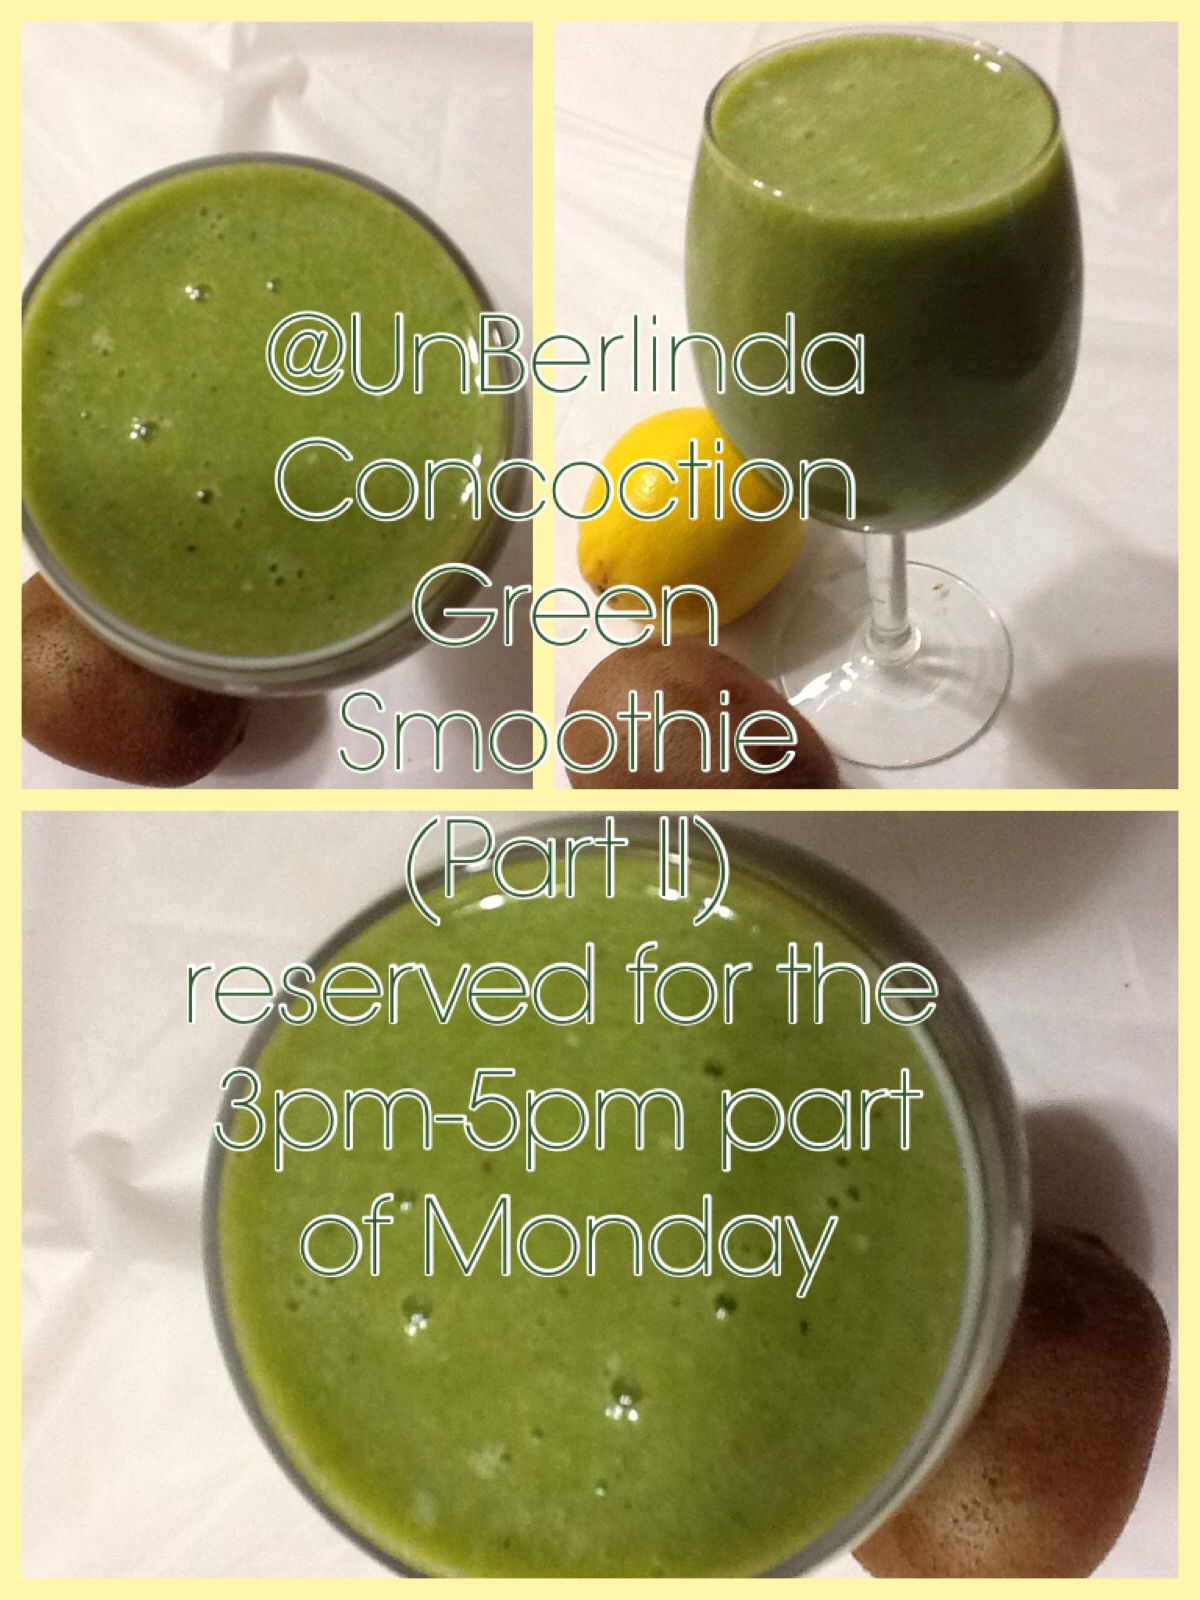 Super smoothie.  a Green Smoothie Kiwi, kale, lemon, watermelon, broccoli, pineapple, banana, strawberries, iced green tea, no sugar added.